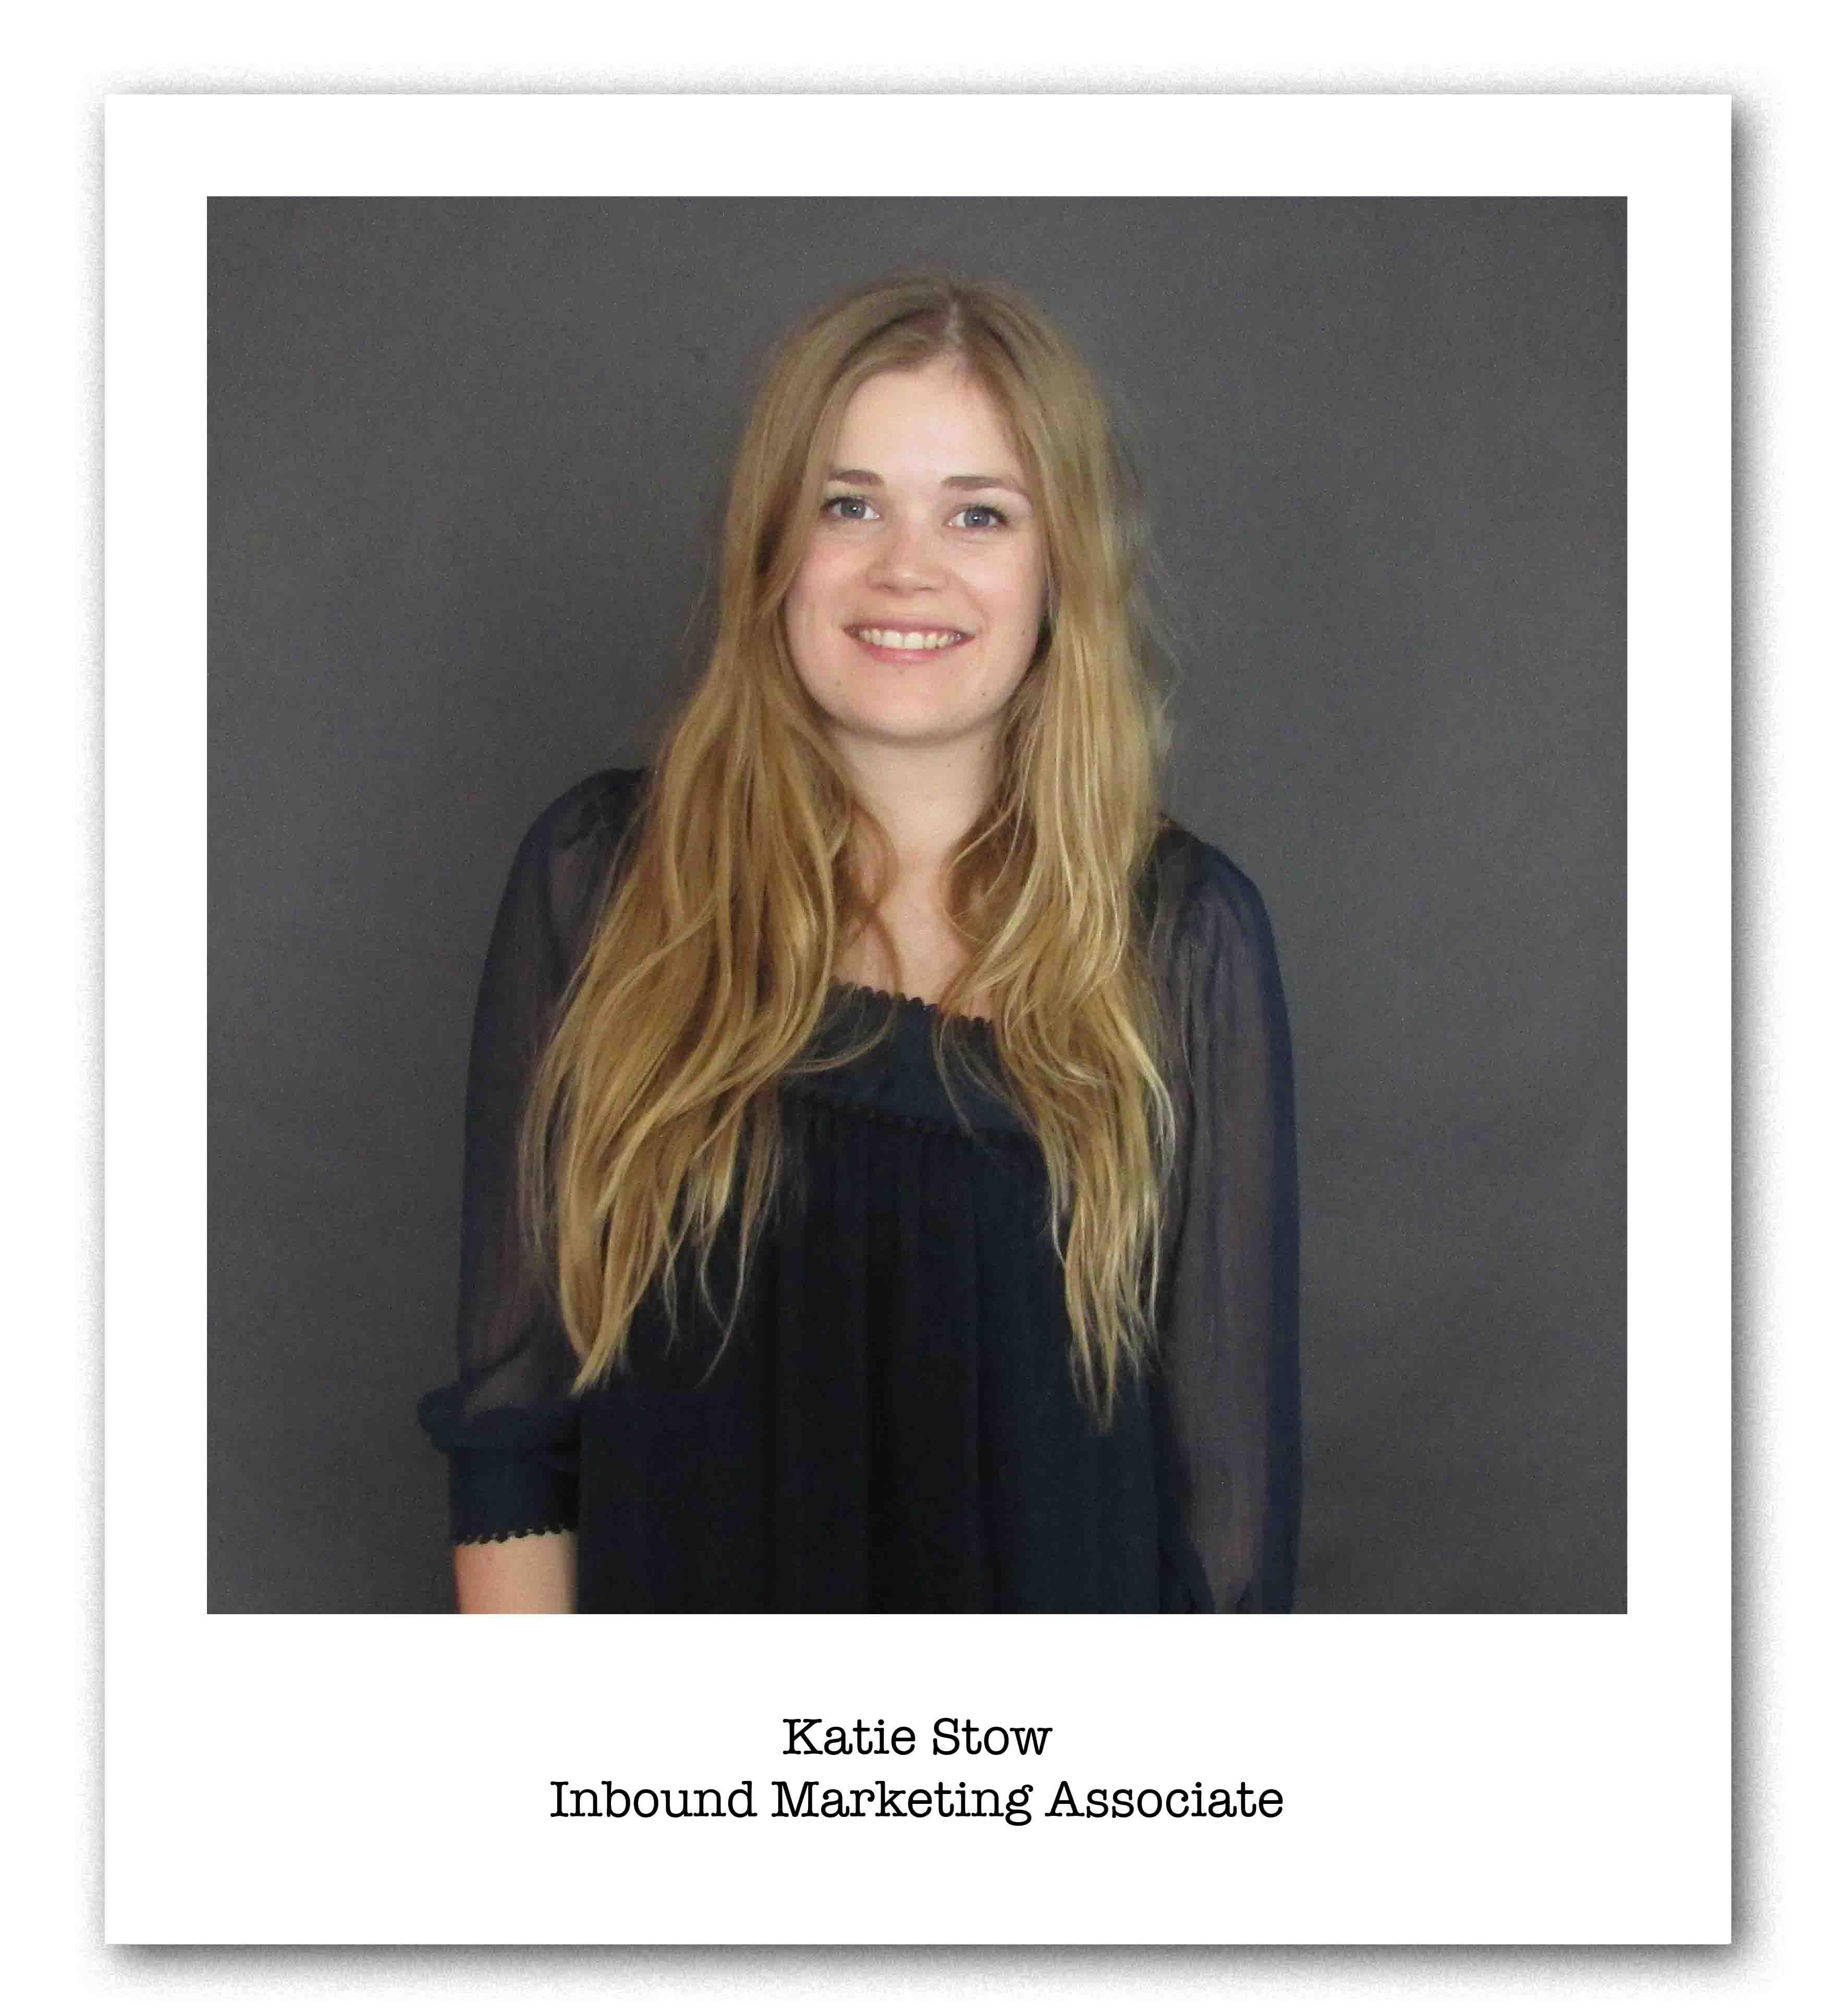 Katie Stow